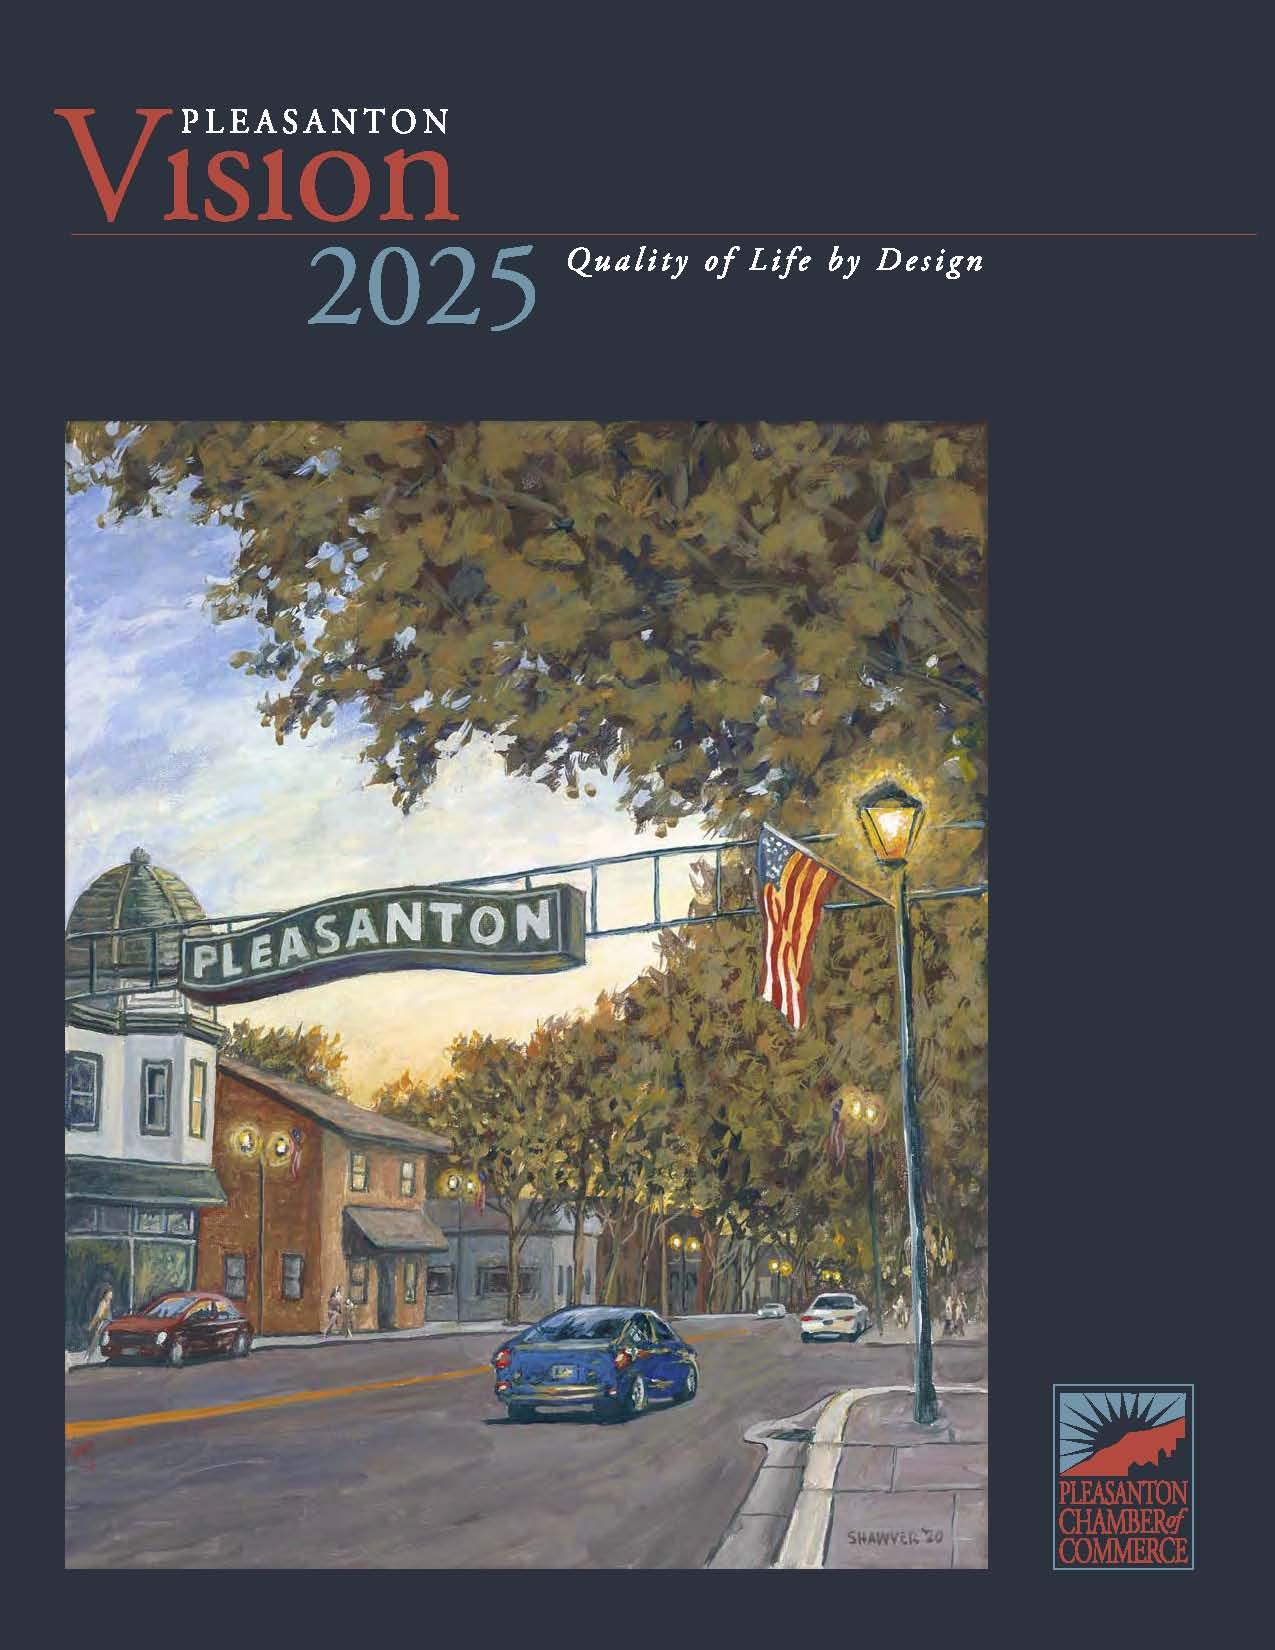 Pleasanton Vision 2025